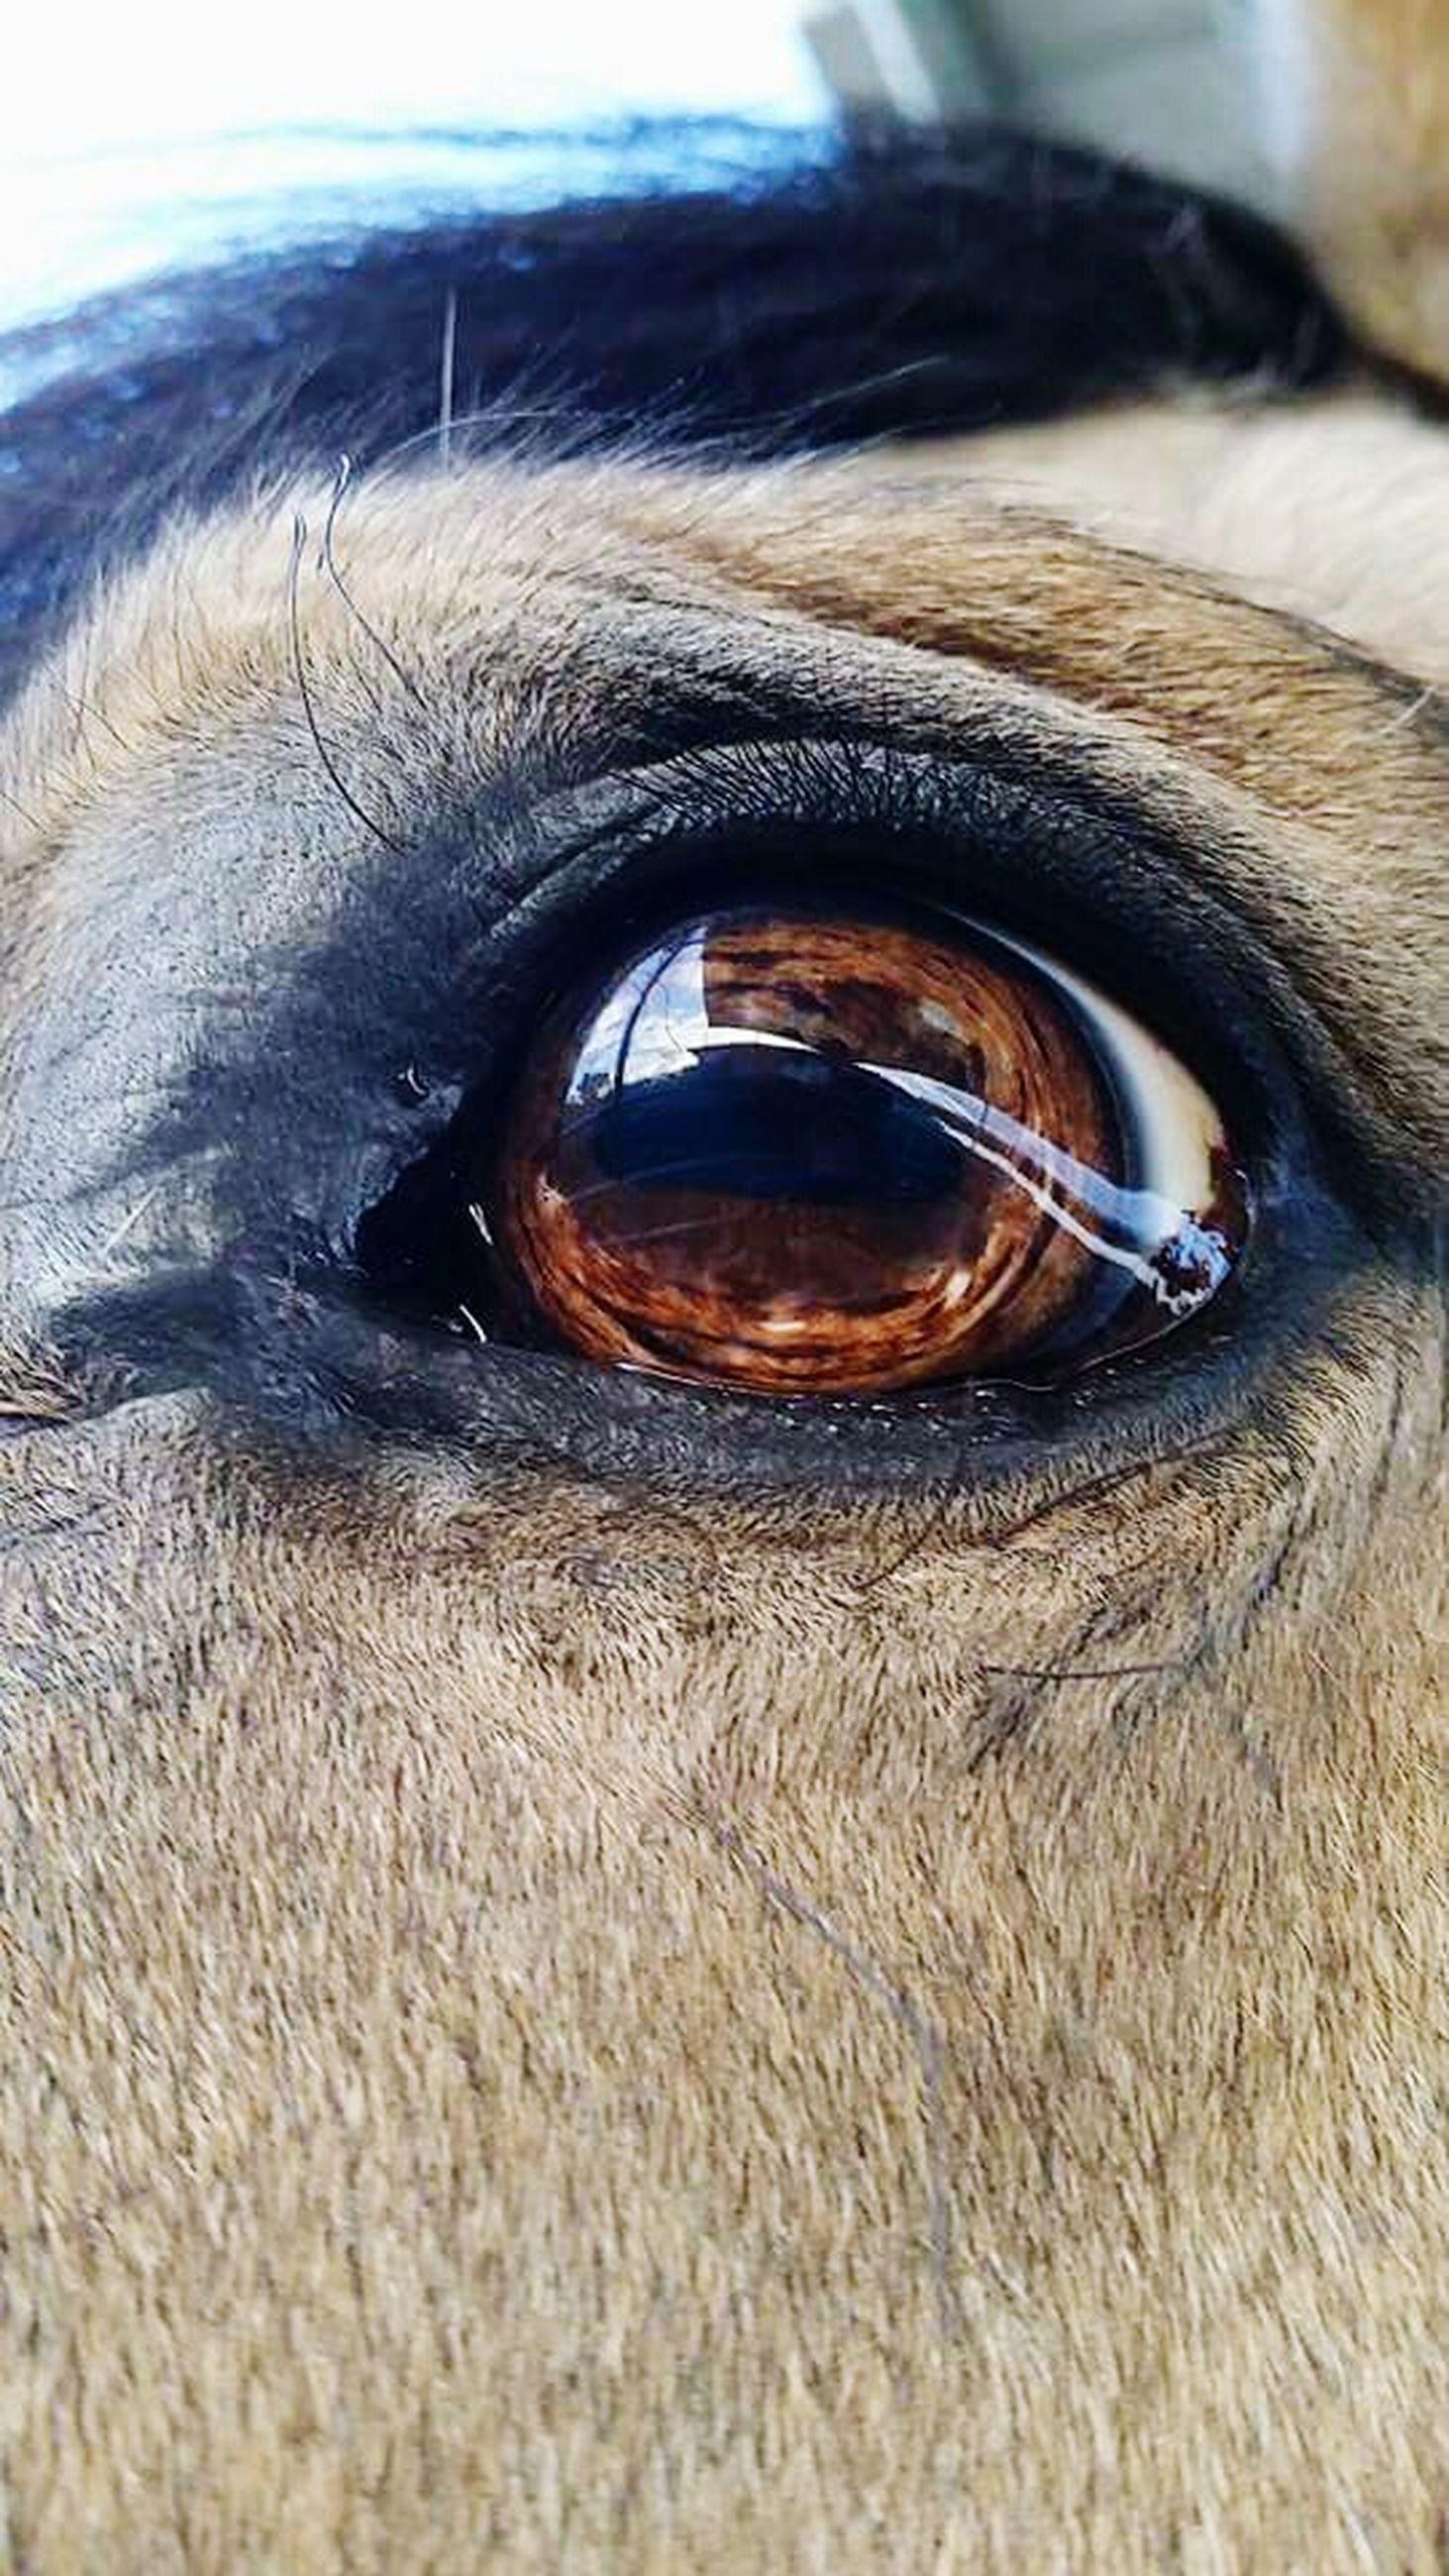 close-up, one animal, animal body part, animal themes, animal eye, eyesight, animal head, extreme close up, part of, extreme close-up, sensory perception, detail, human eye, domestic animals, eyelash, selective focus, vision, portrait, looking at camera